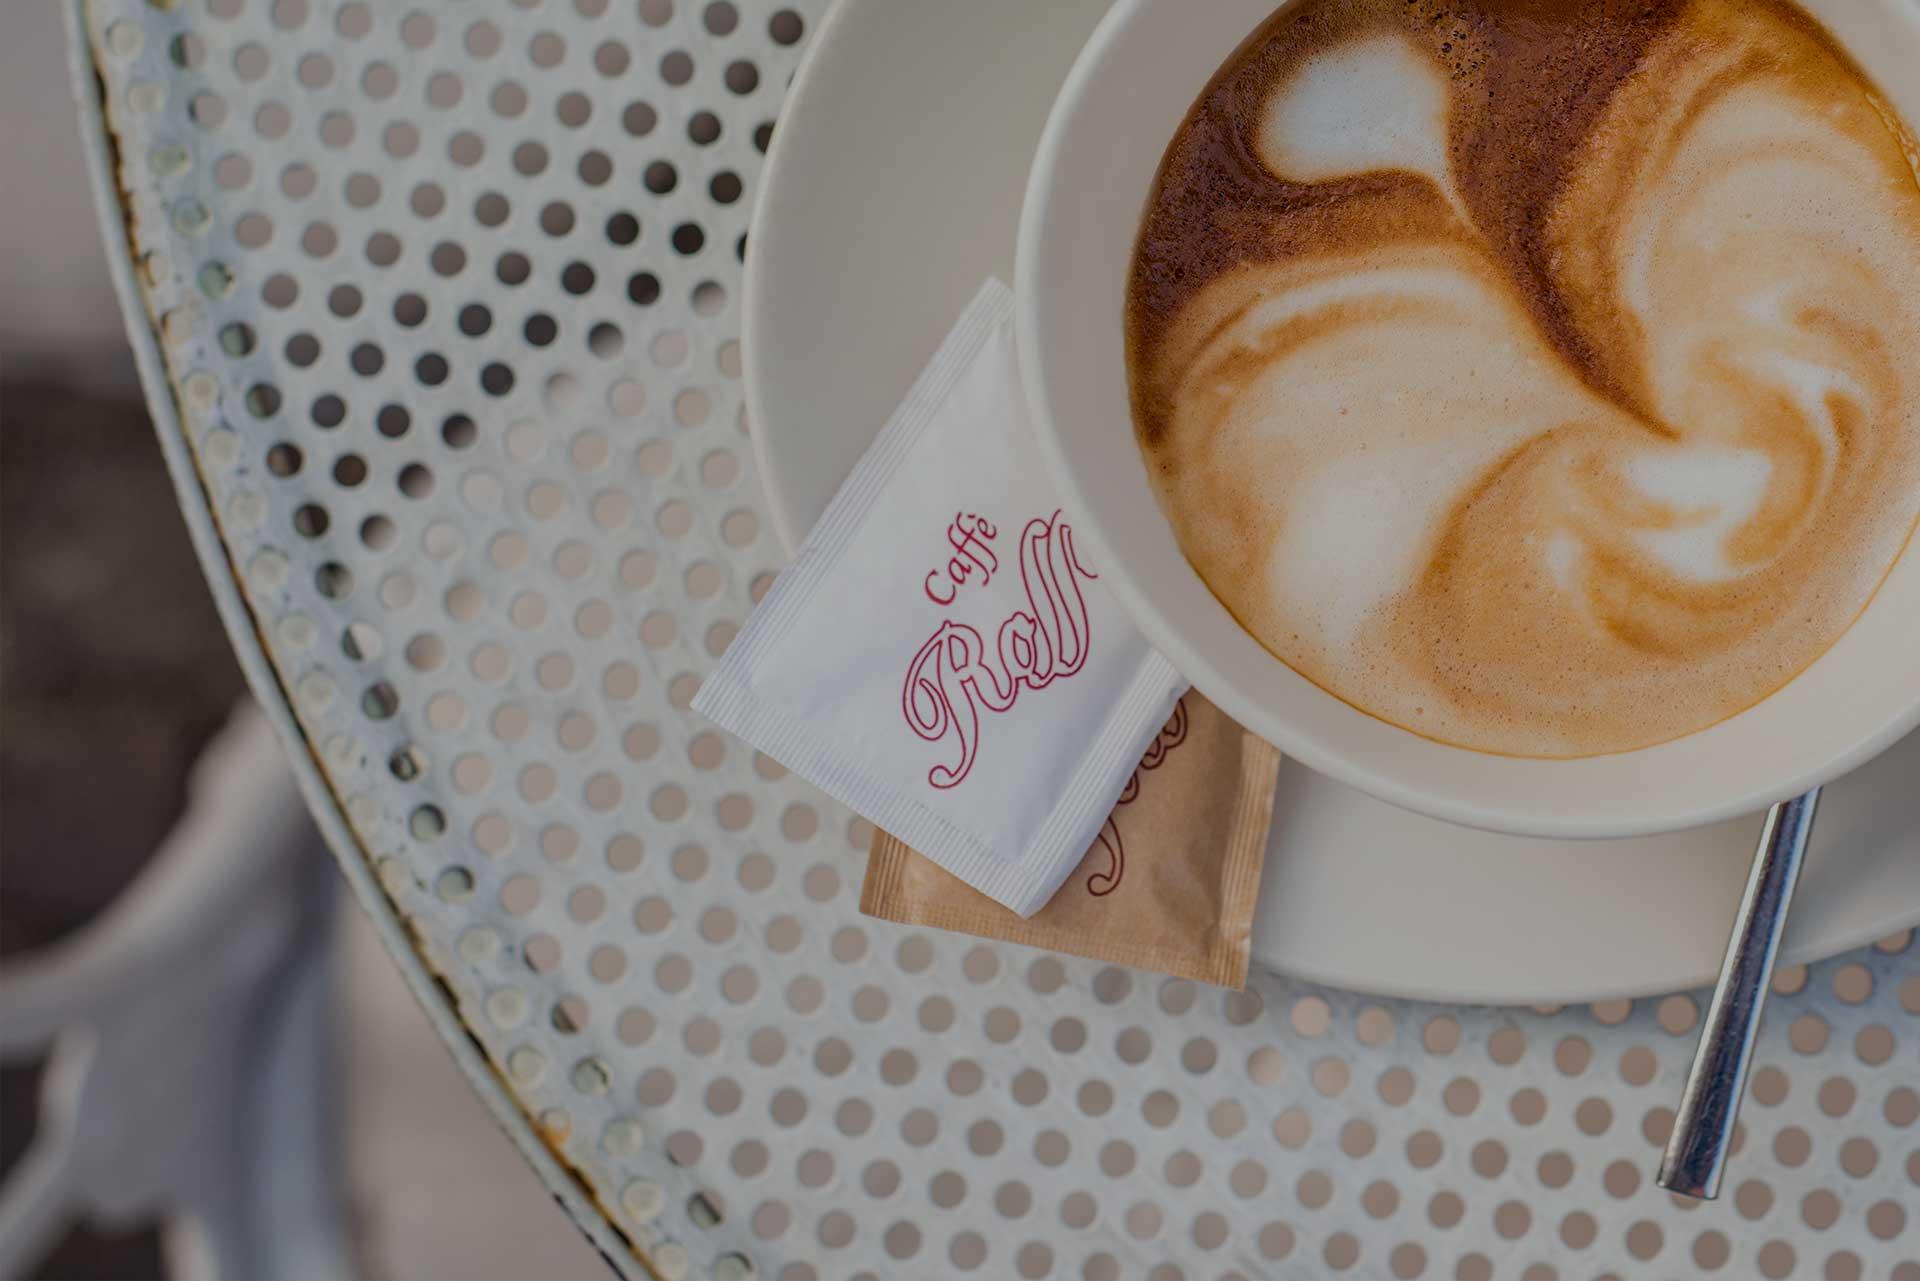 rossini alba, caffè rossini alba, torrefazione rossini, torrefazioni alba, caffè alba, miscele per bar, miscele caffè per bar